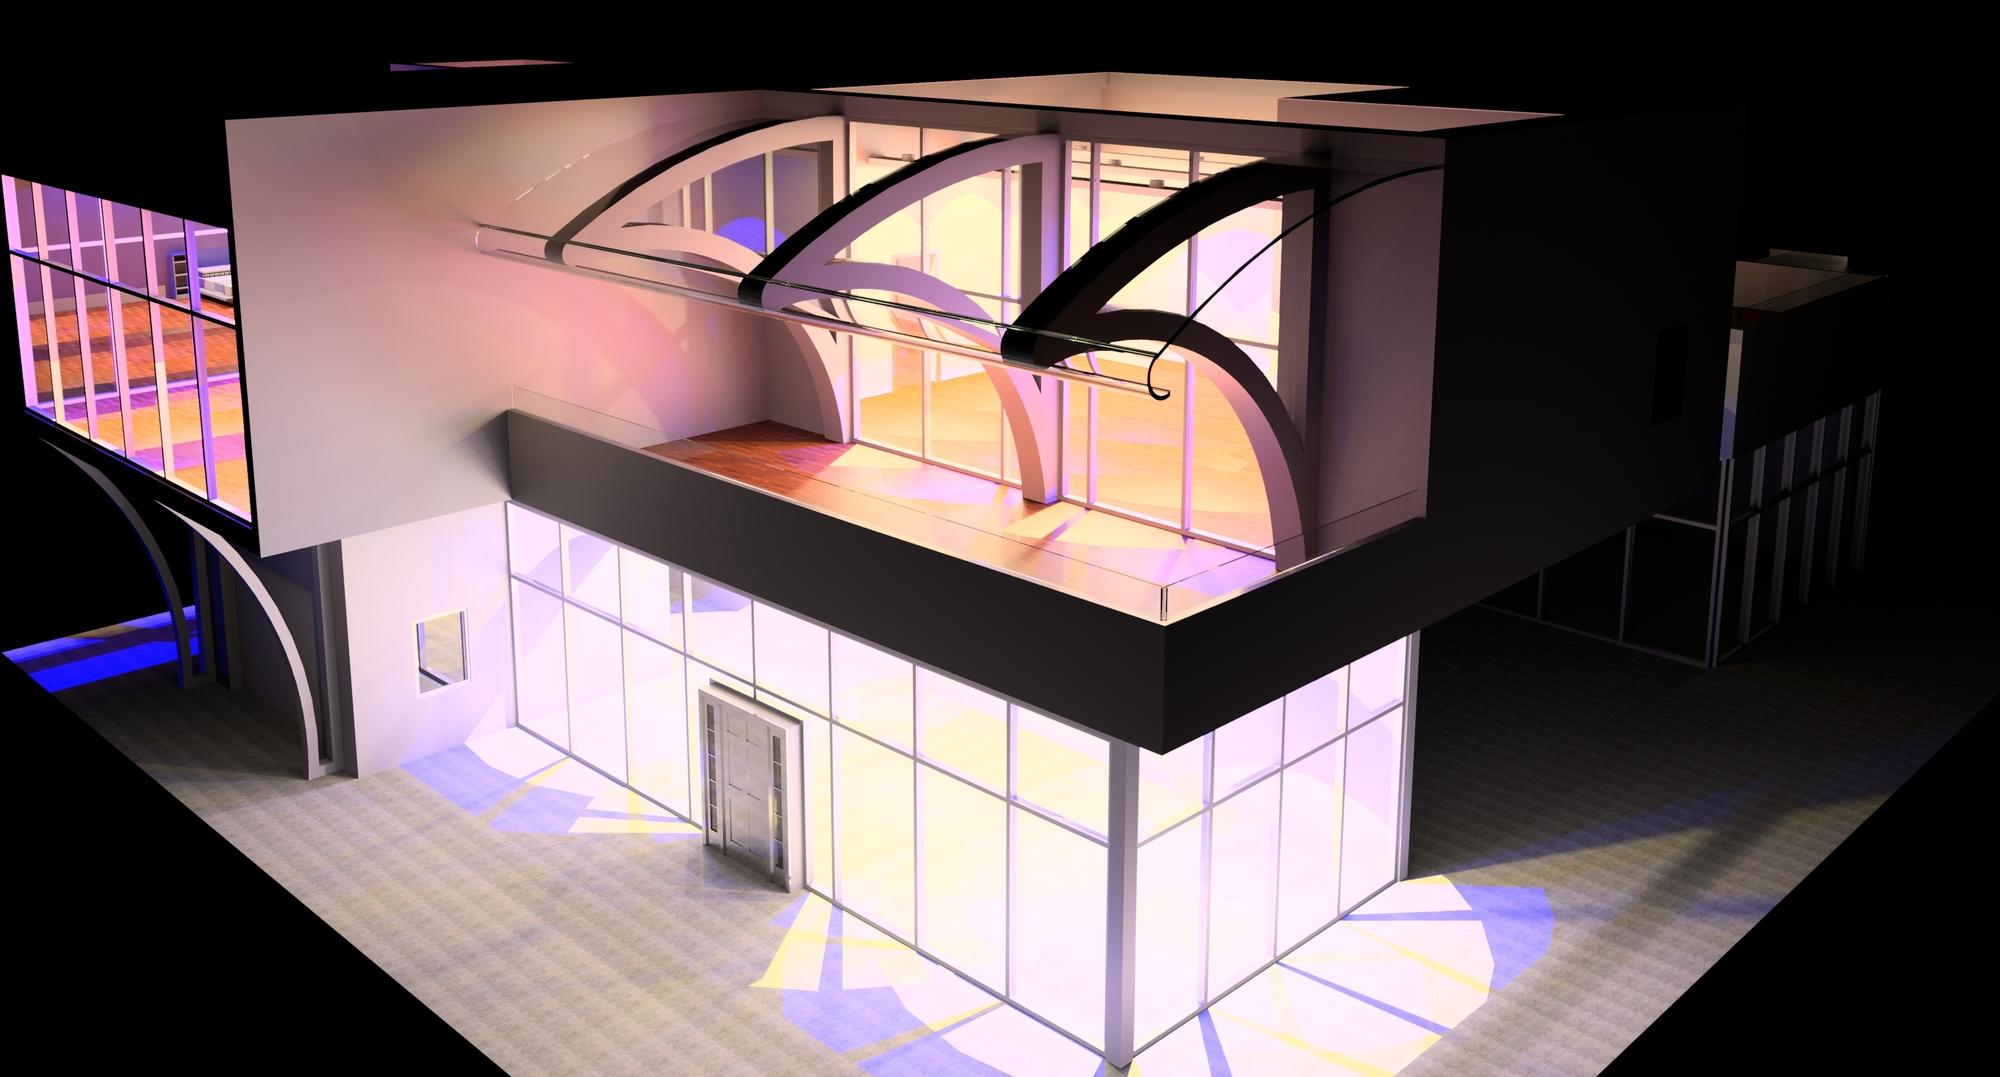 Raas-rendering20150326-2169-1vheclc